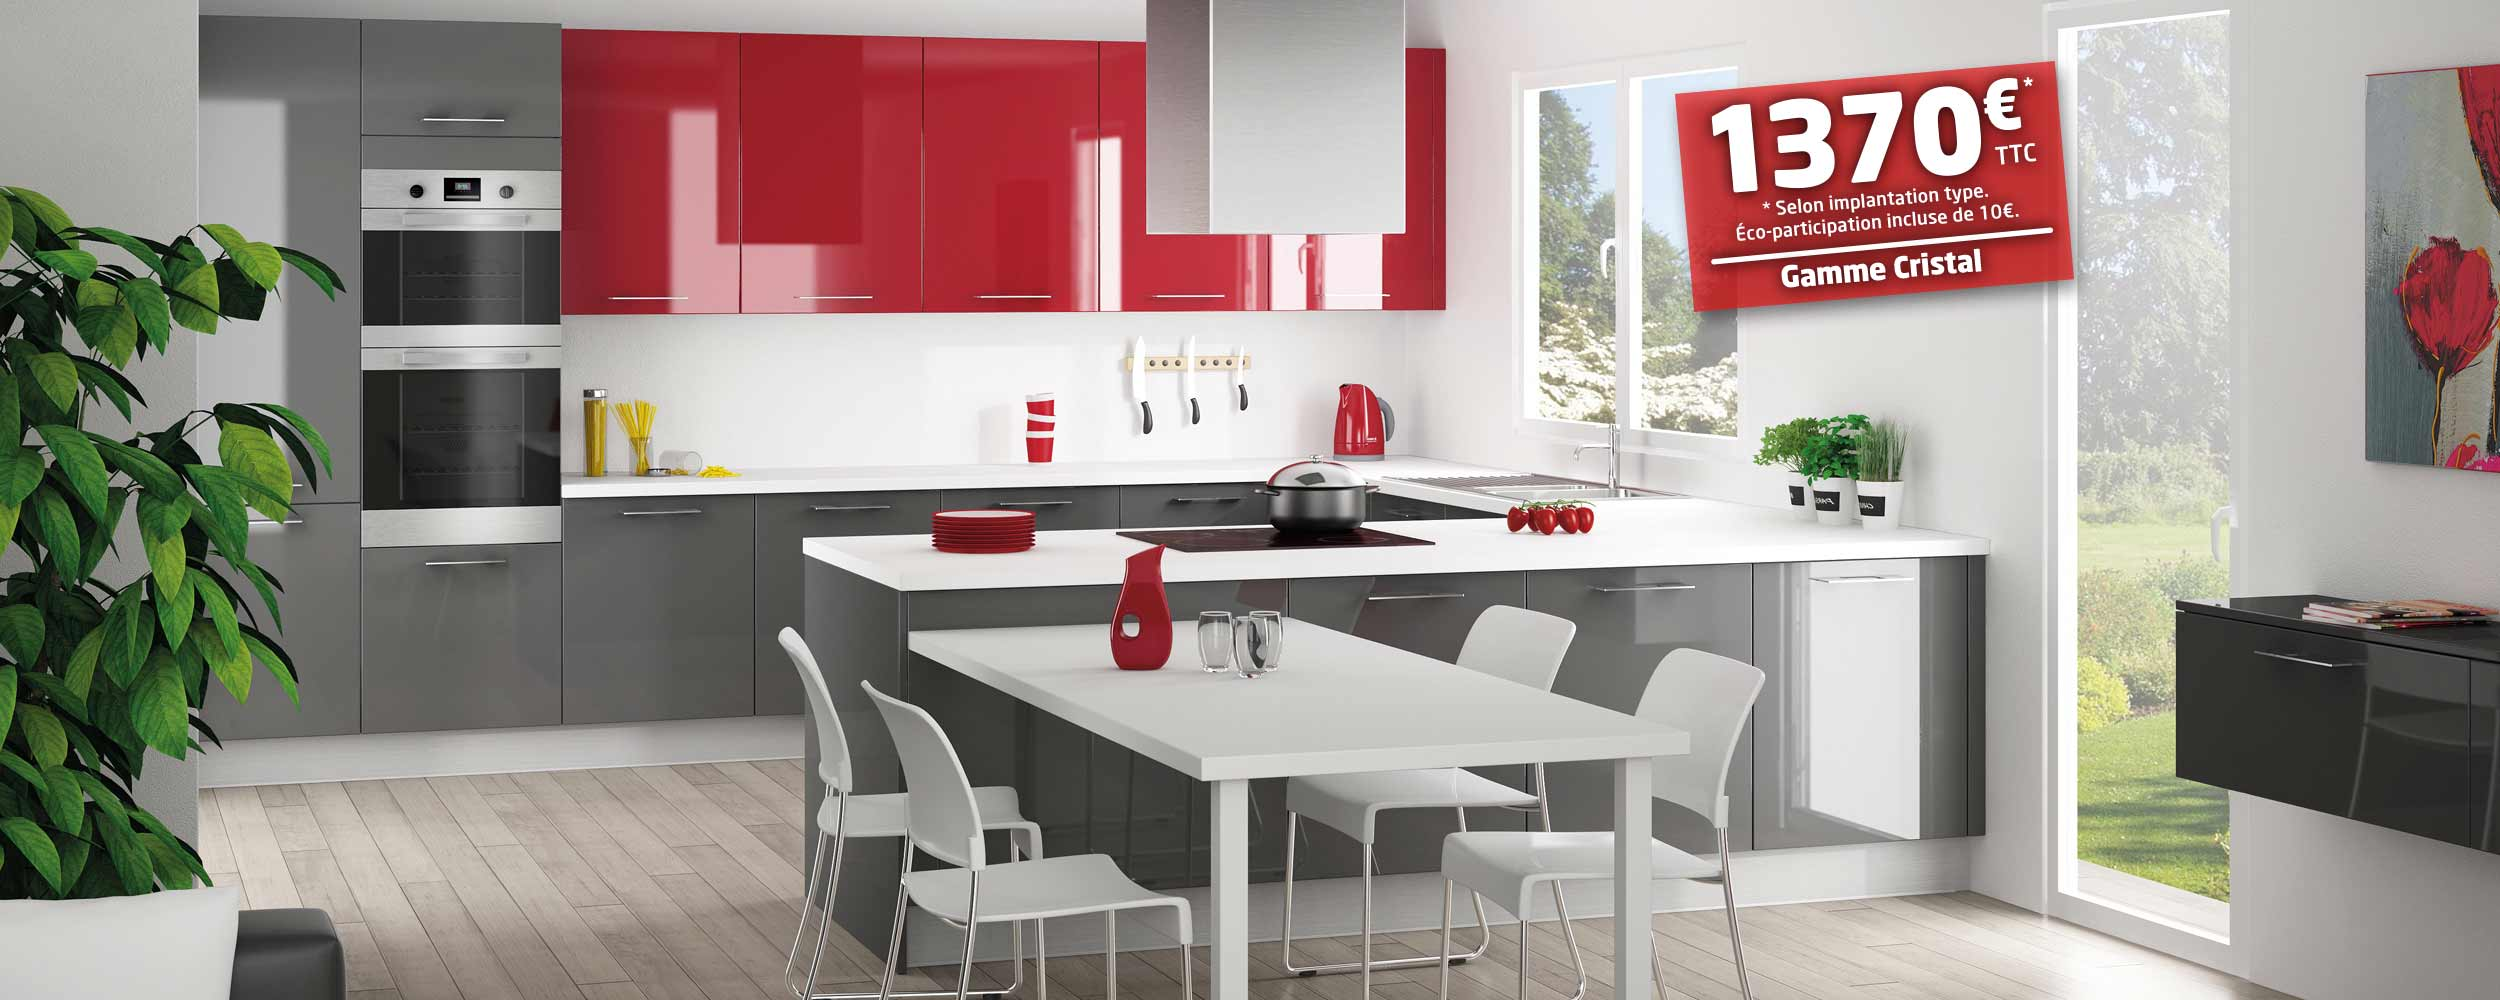 idea-cuisines-63-les-cristaux-laques-2500x800